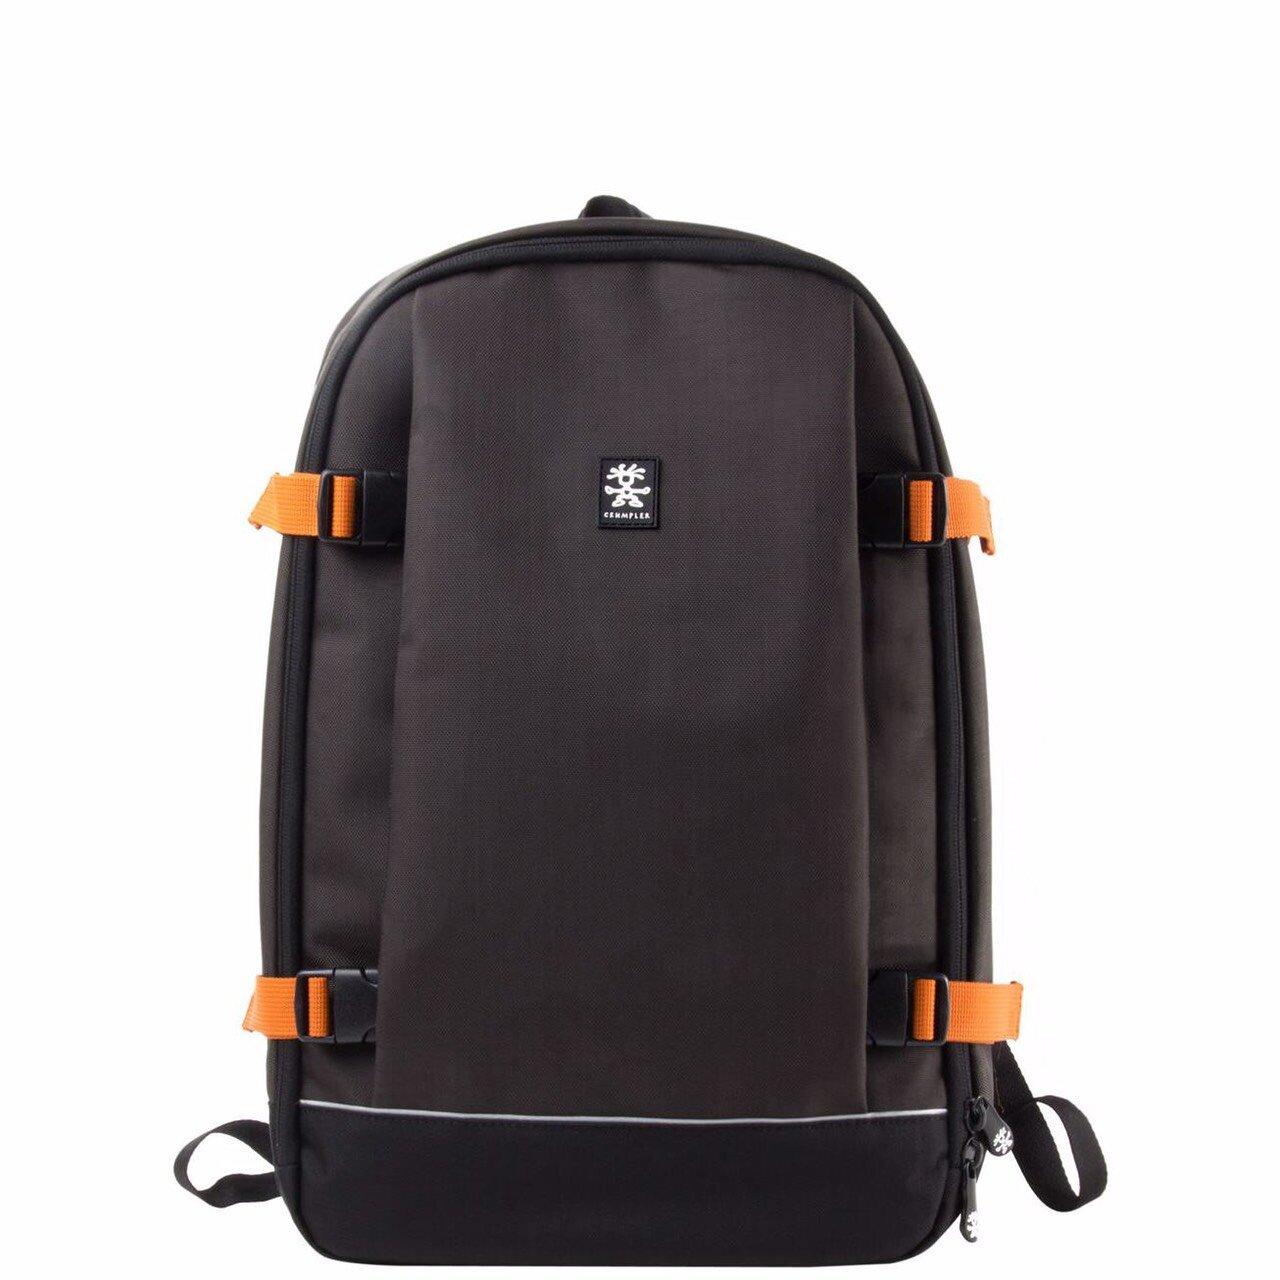 Balo đựng laptop 15.6 inch Crumpler Proper Roady